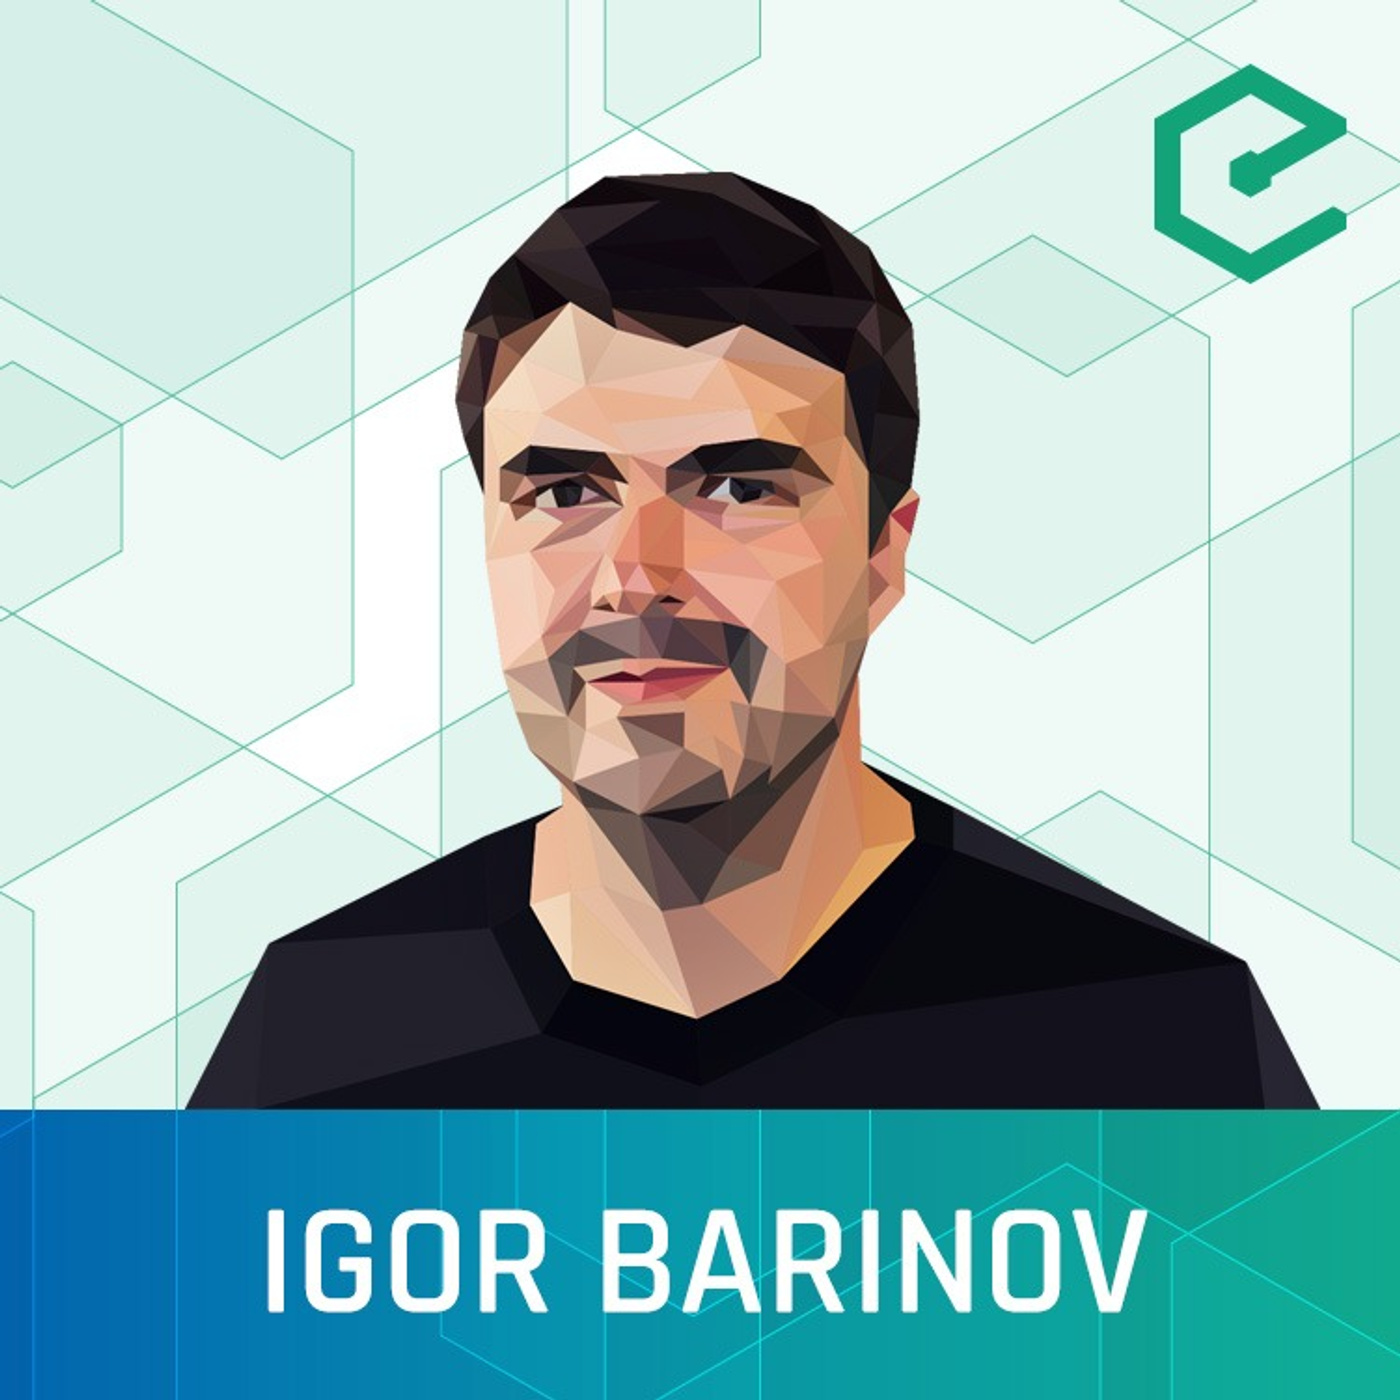 Igor Barinov: POA Network – Enabling Scaling Through Trust in Public Notaries